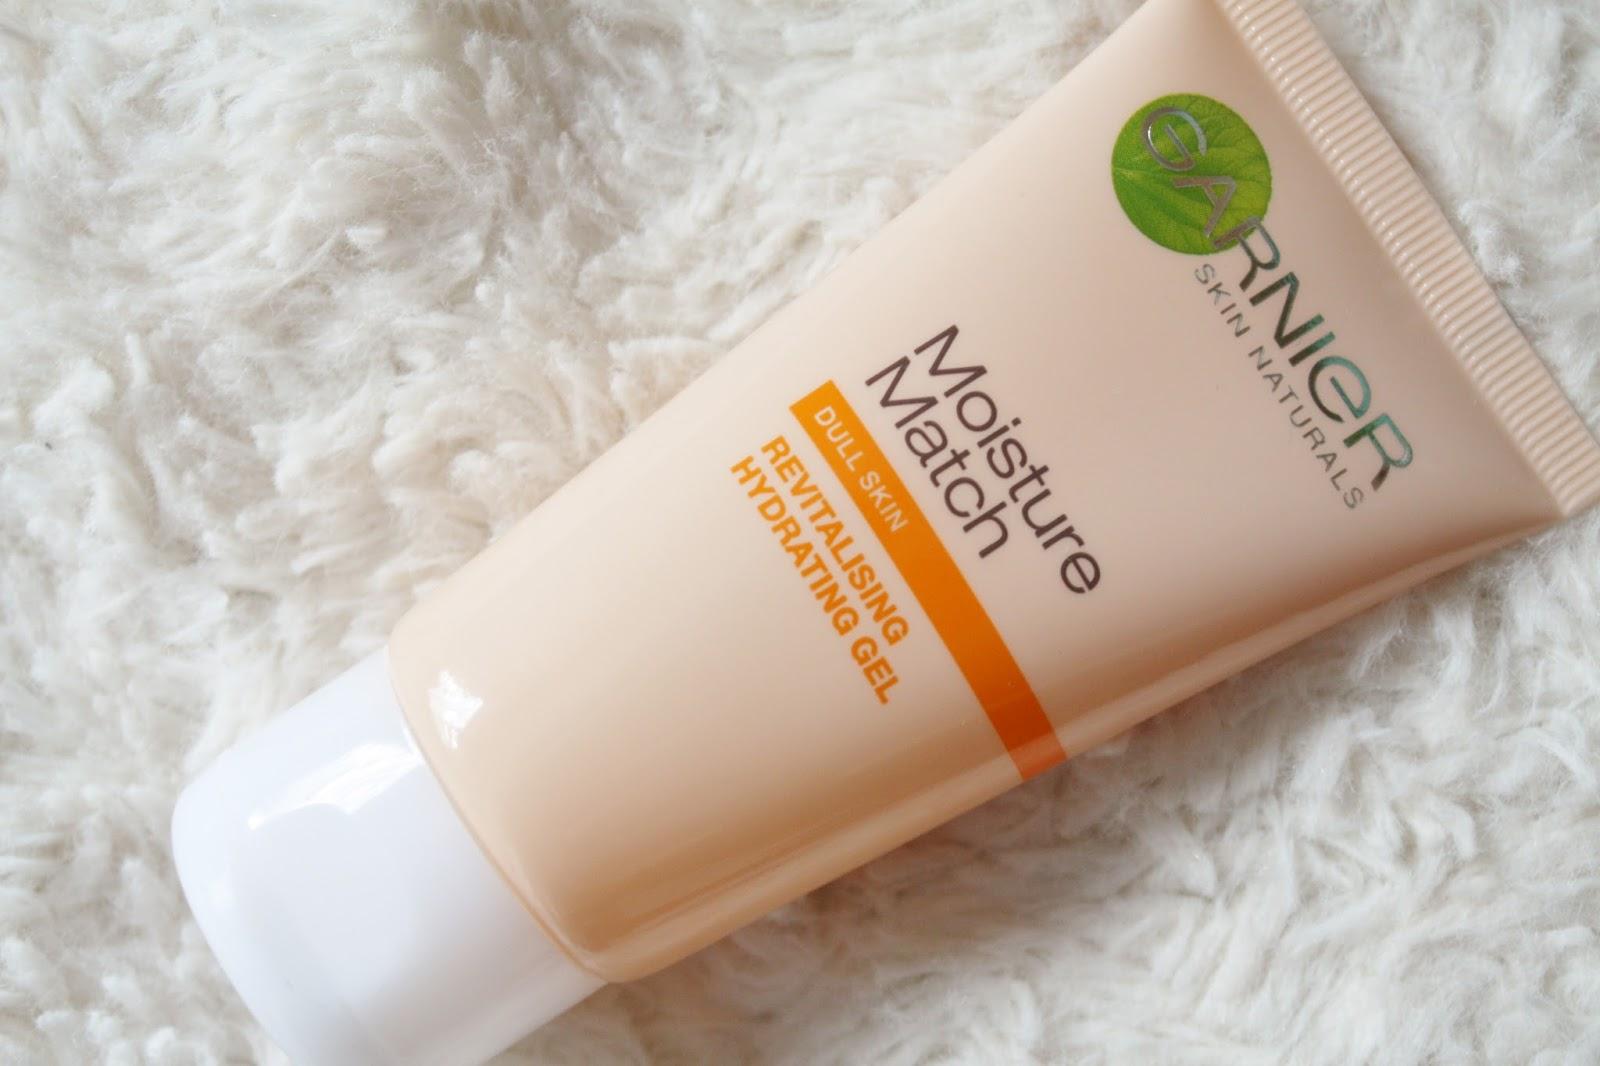 Review - Garnier Moisture Match Revitalising Hydrating Gel